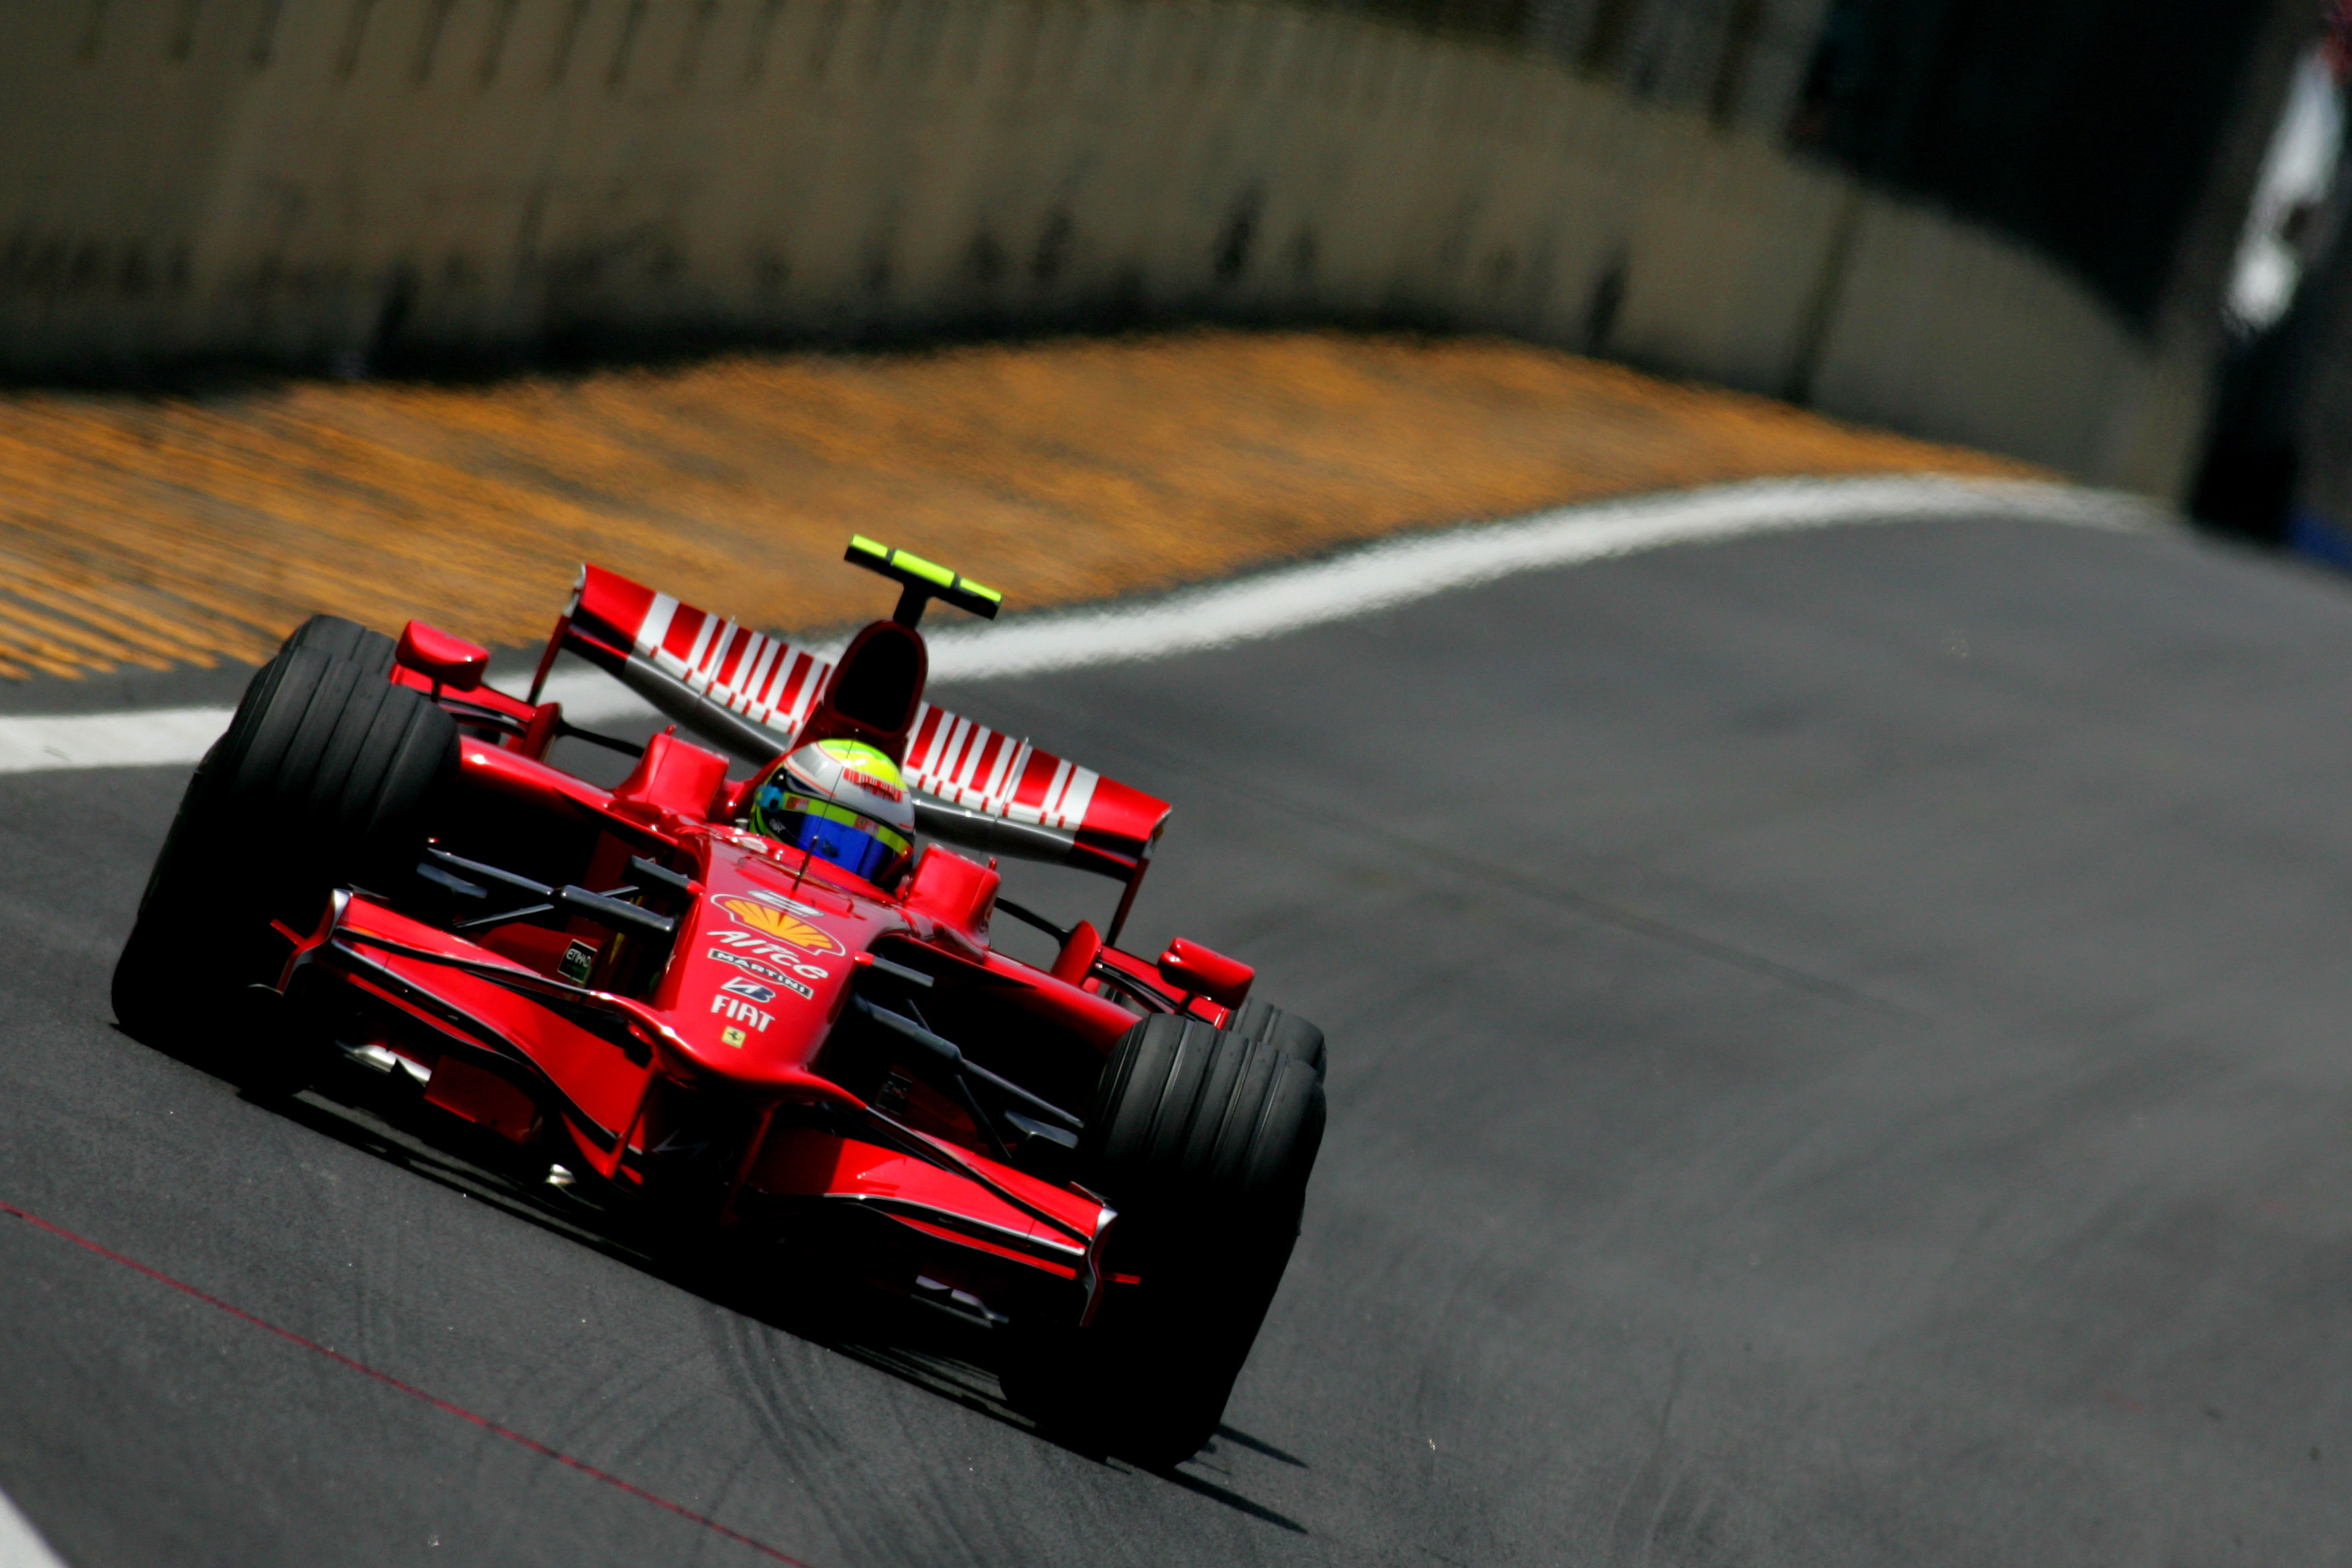 Formula 1 Grand Prix, Brazil, Saturday Qualifying